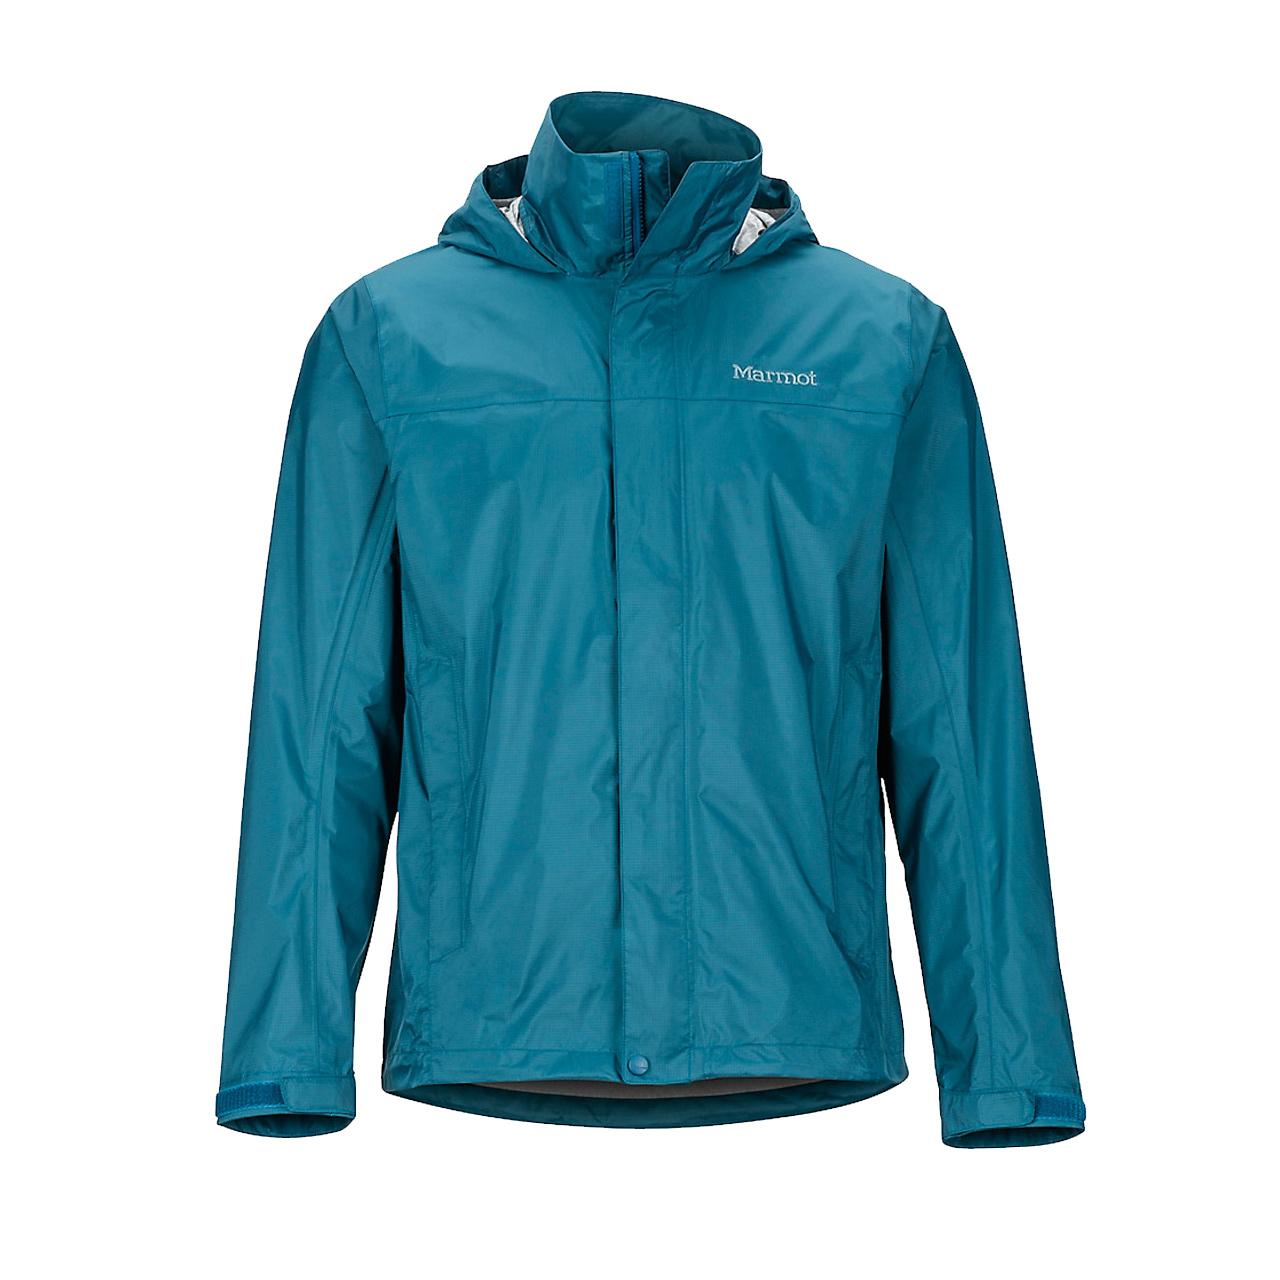 Eco Jacket Marmot Precip MenTapir Store dtCsrhQx